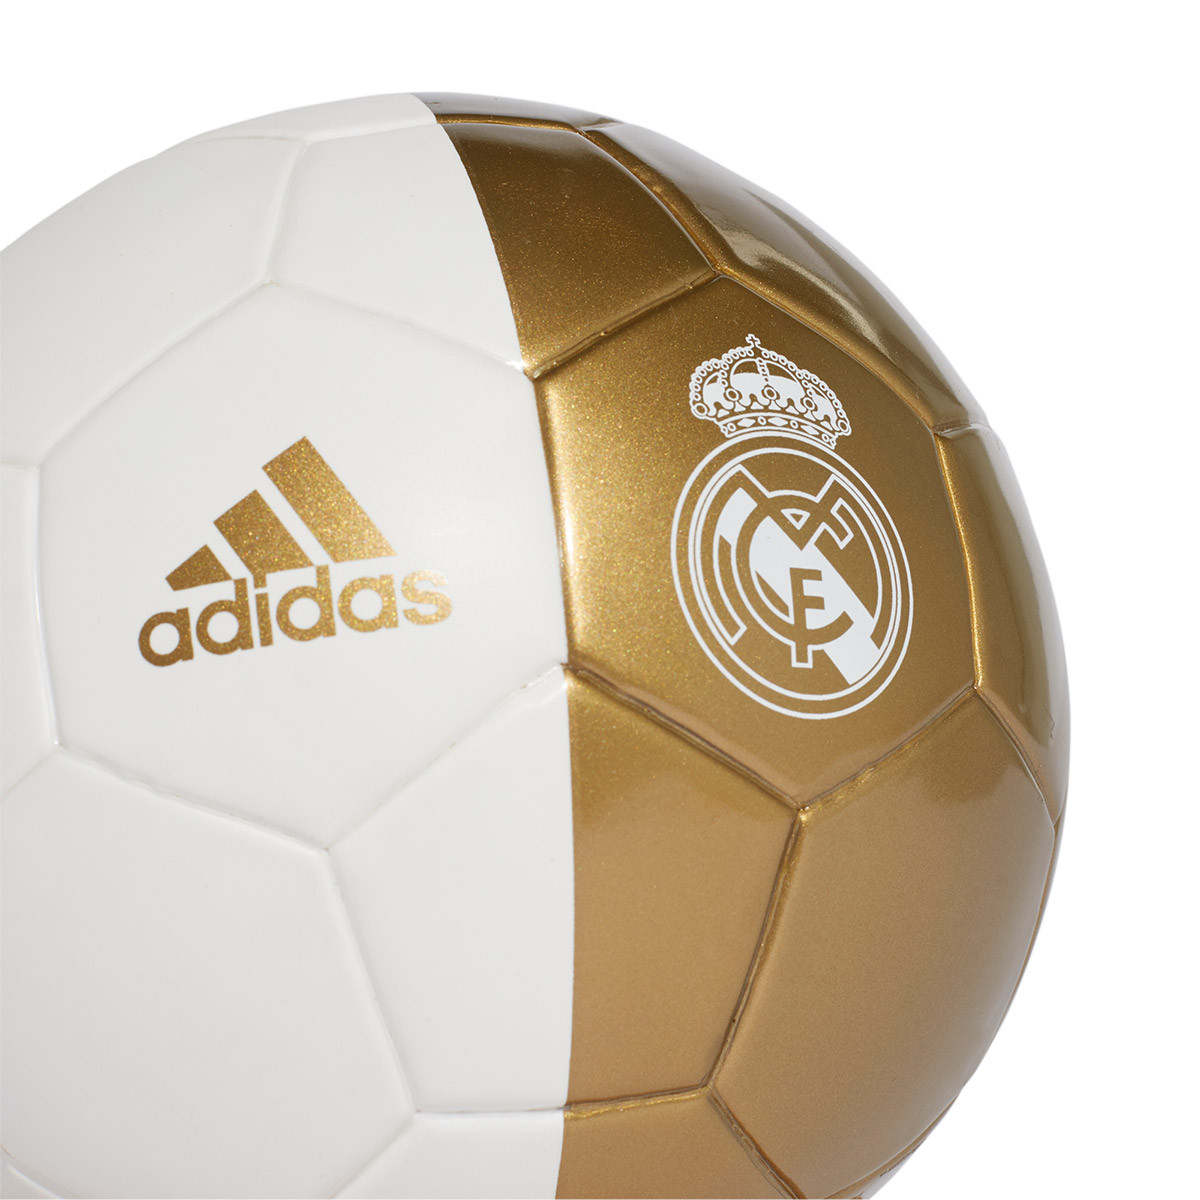 a40c4b3b1 Balón adidas Mini Real Madrid 2019-2020 White-Dark football gold - Tienda  de fútbol Fútbol Emotion